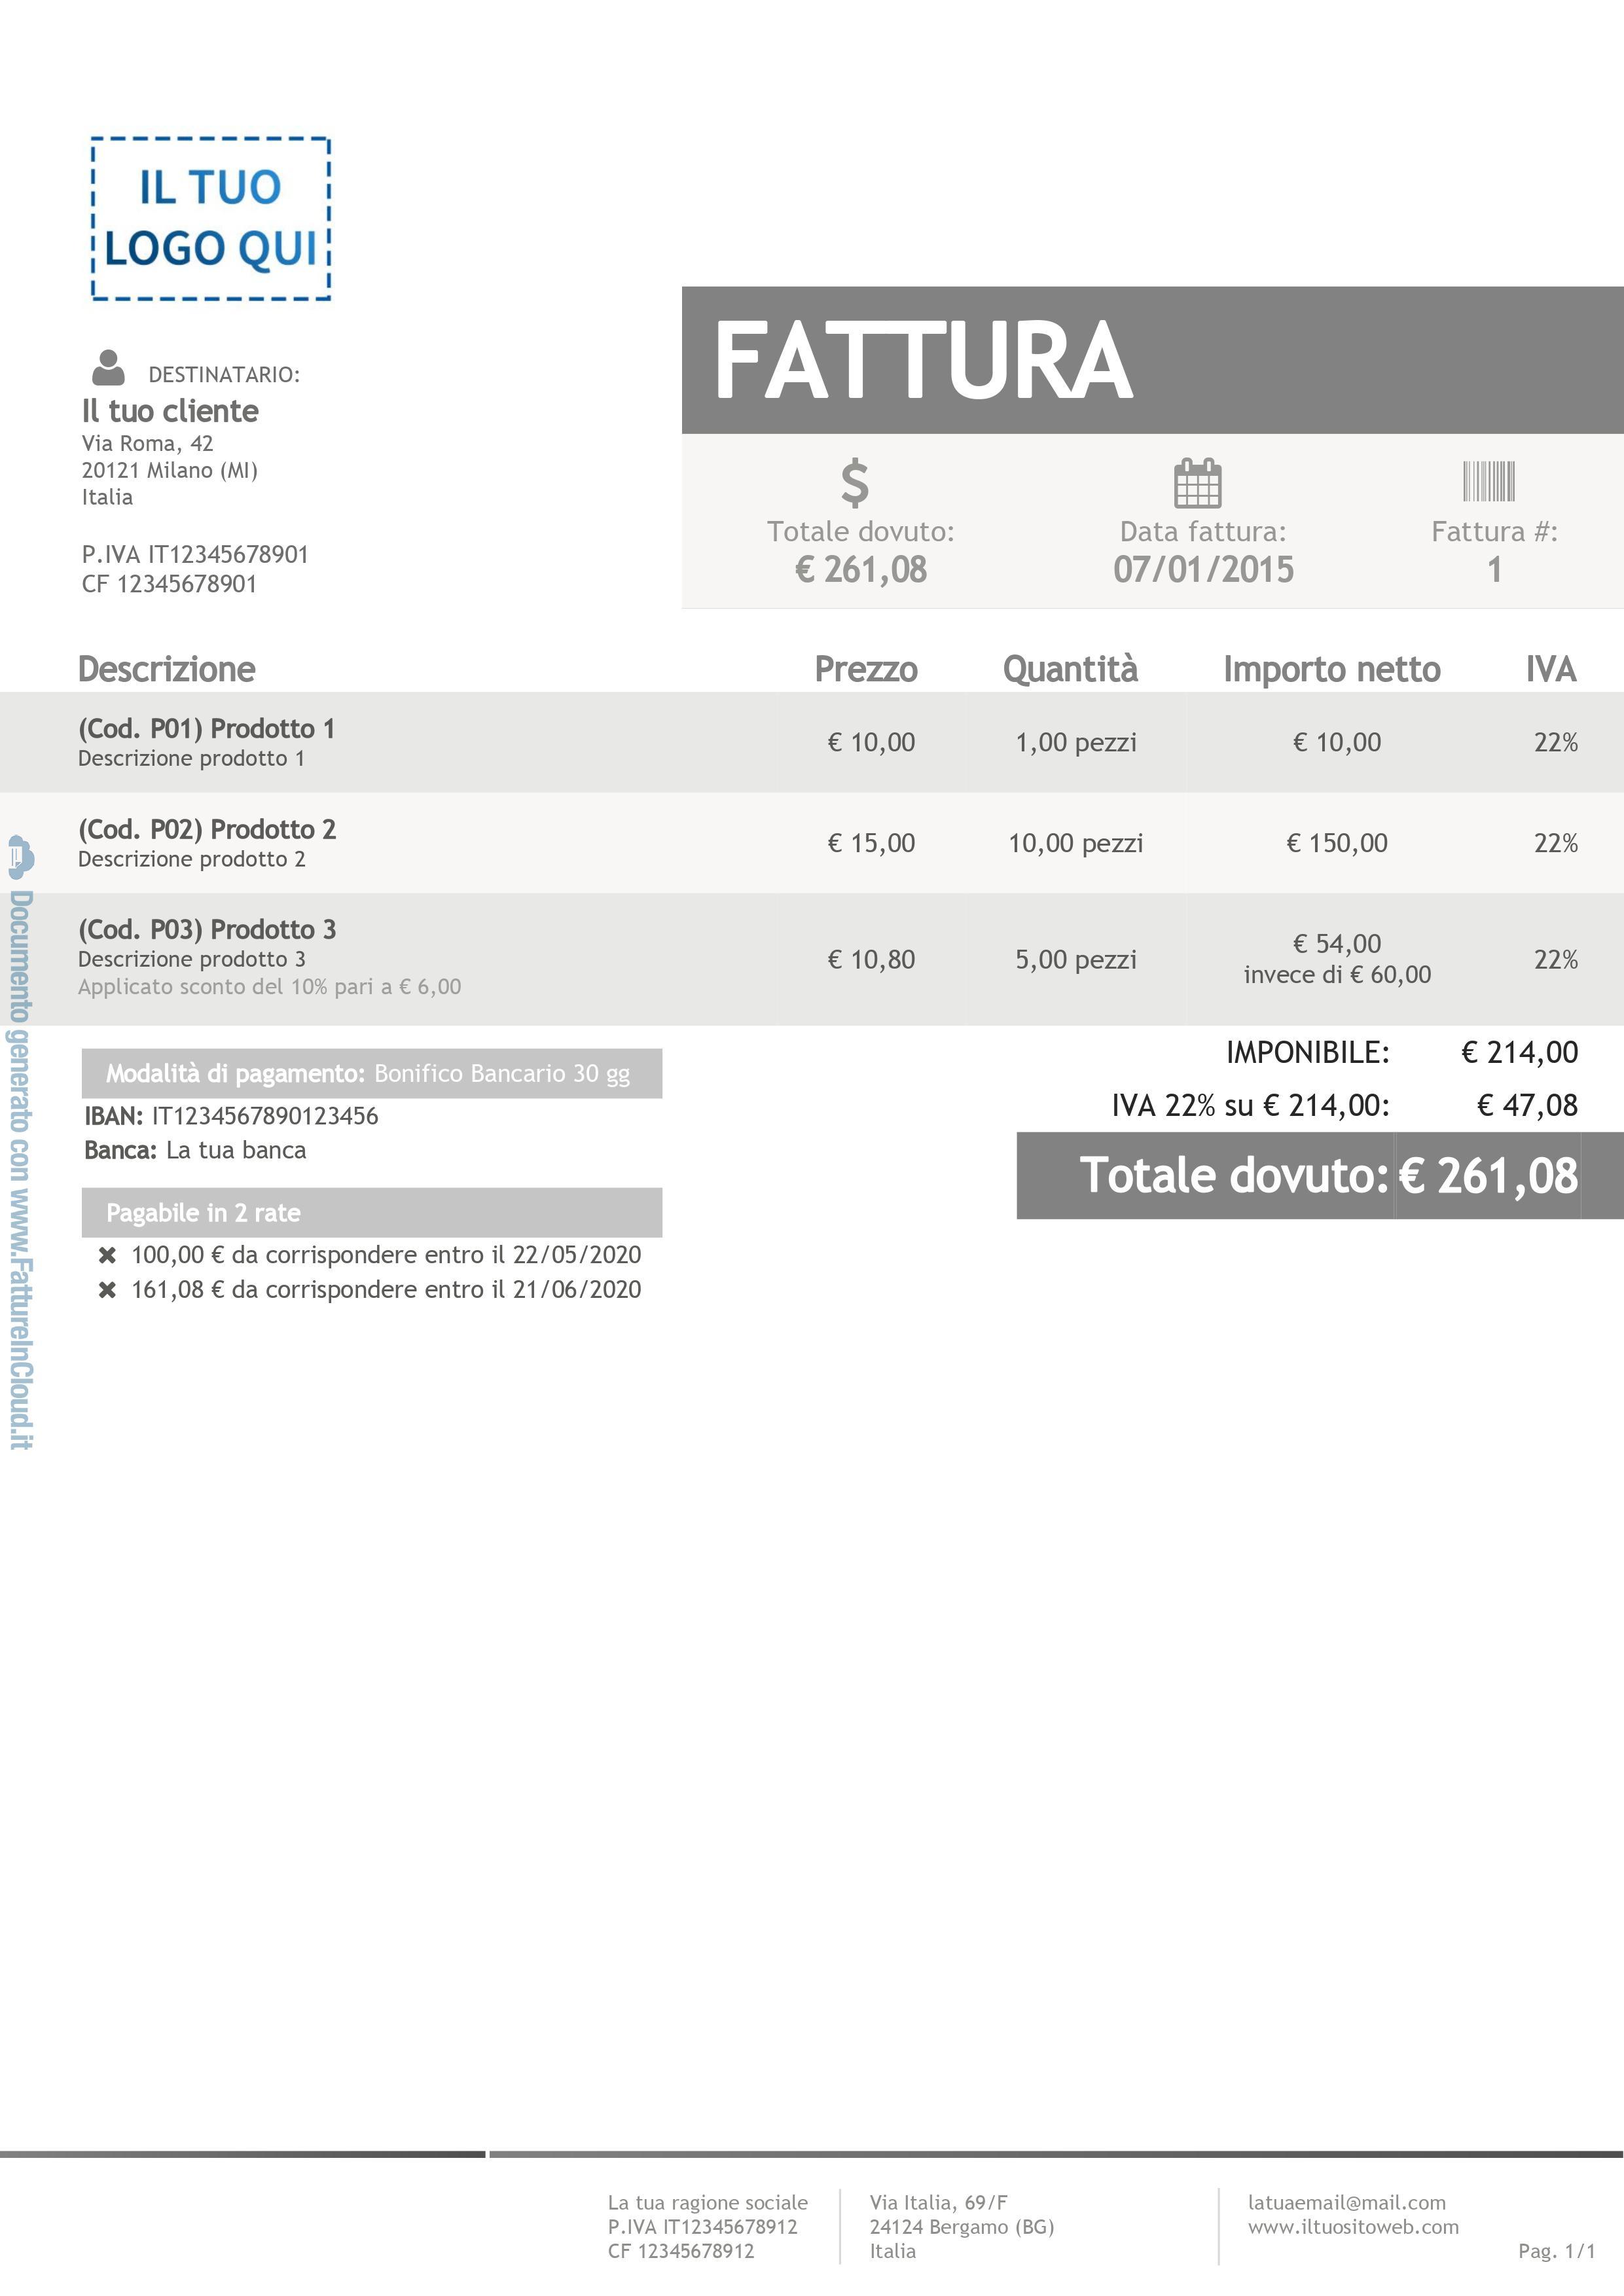 Modello Per Fattura E Template Per Documenti Fatture In Cloud